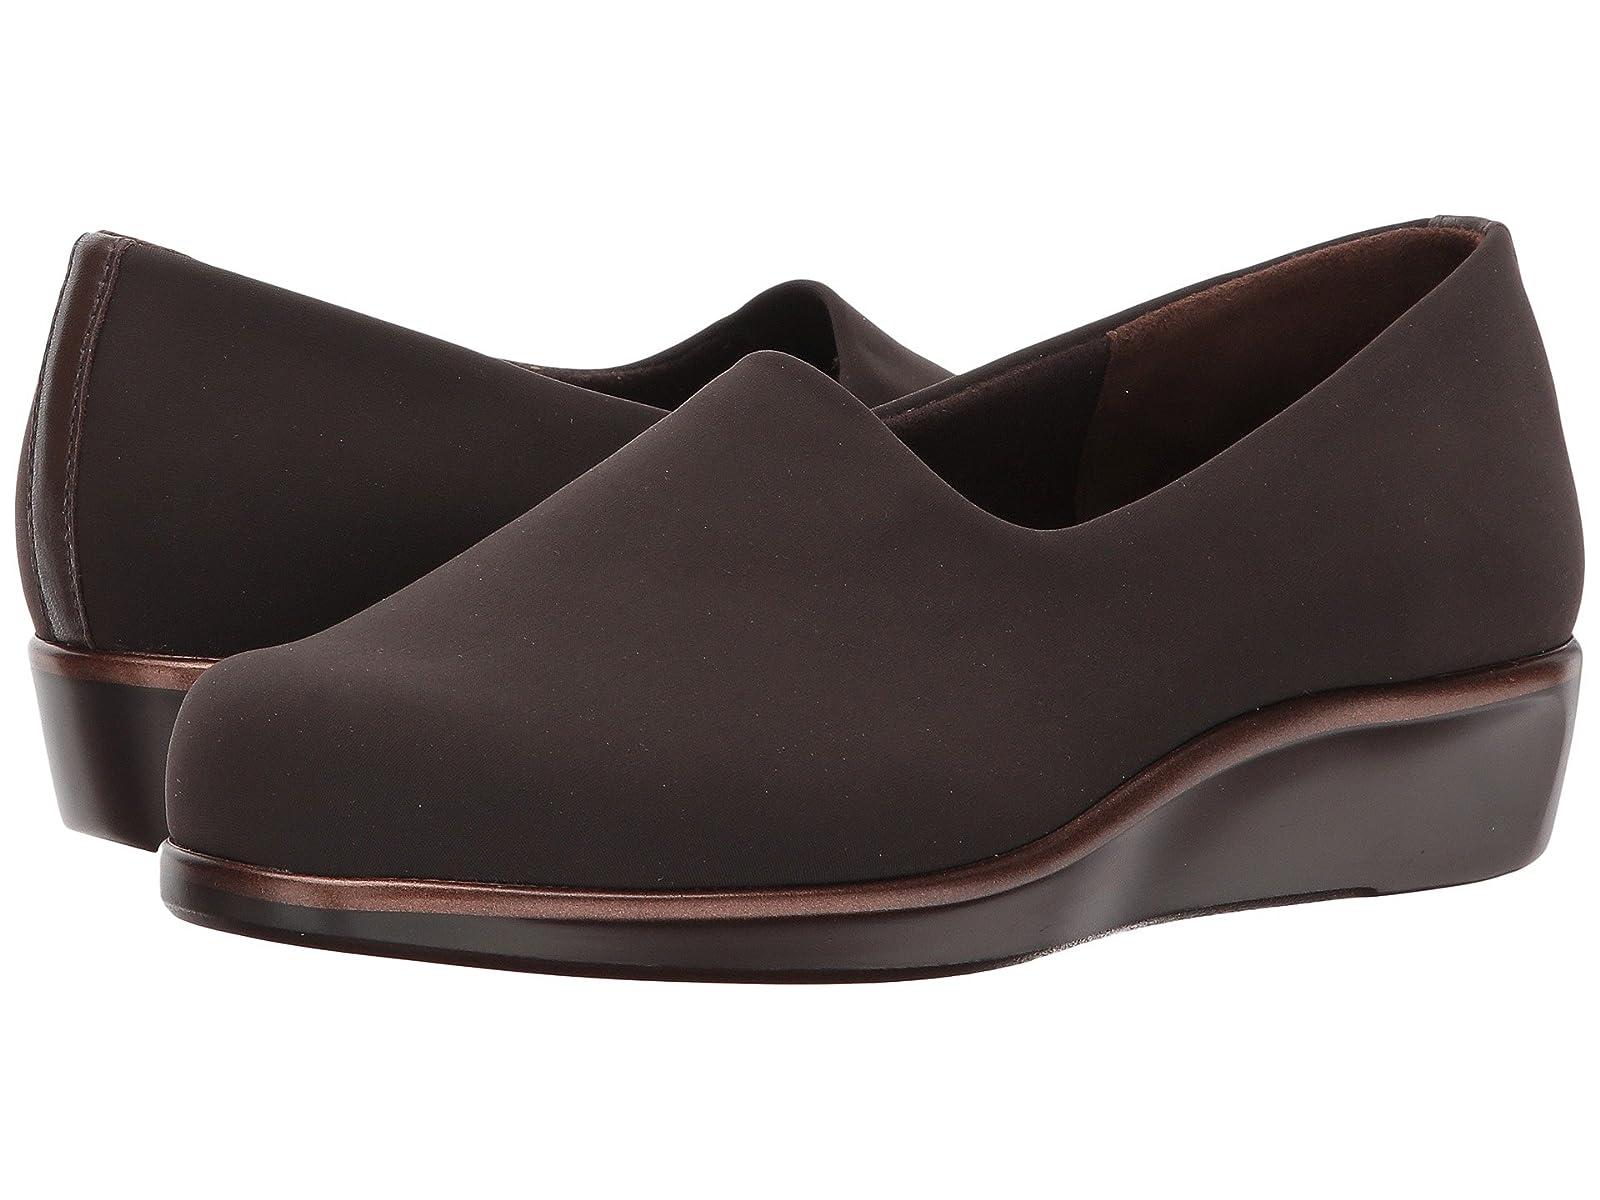 SAS BlissAtmospheric grades have affordable shoes